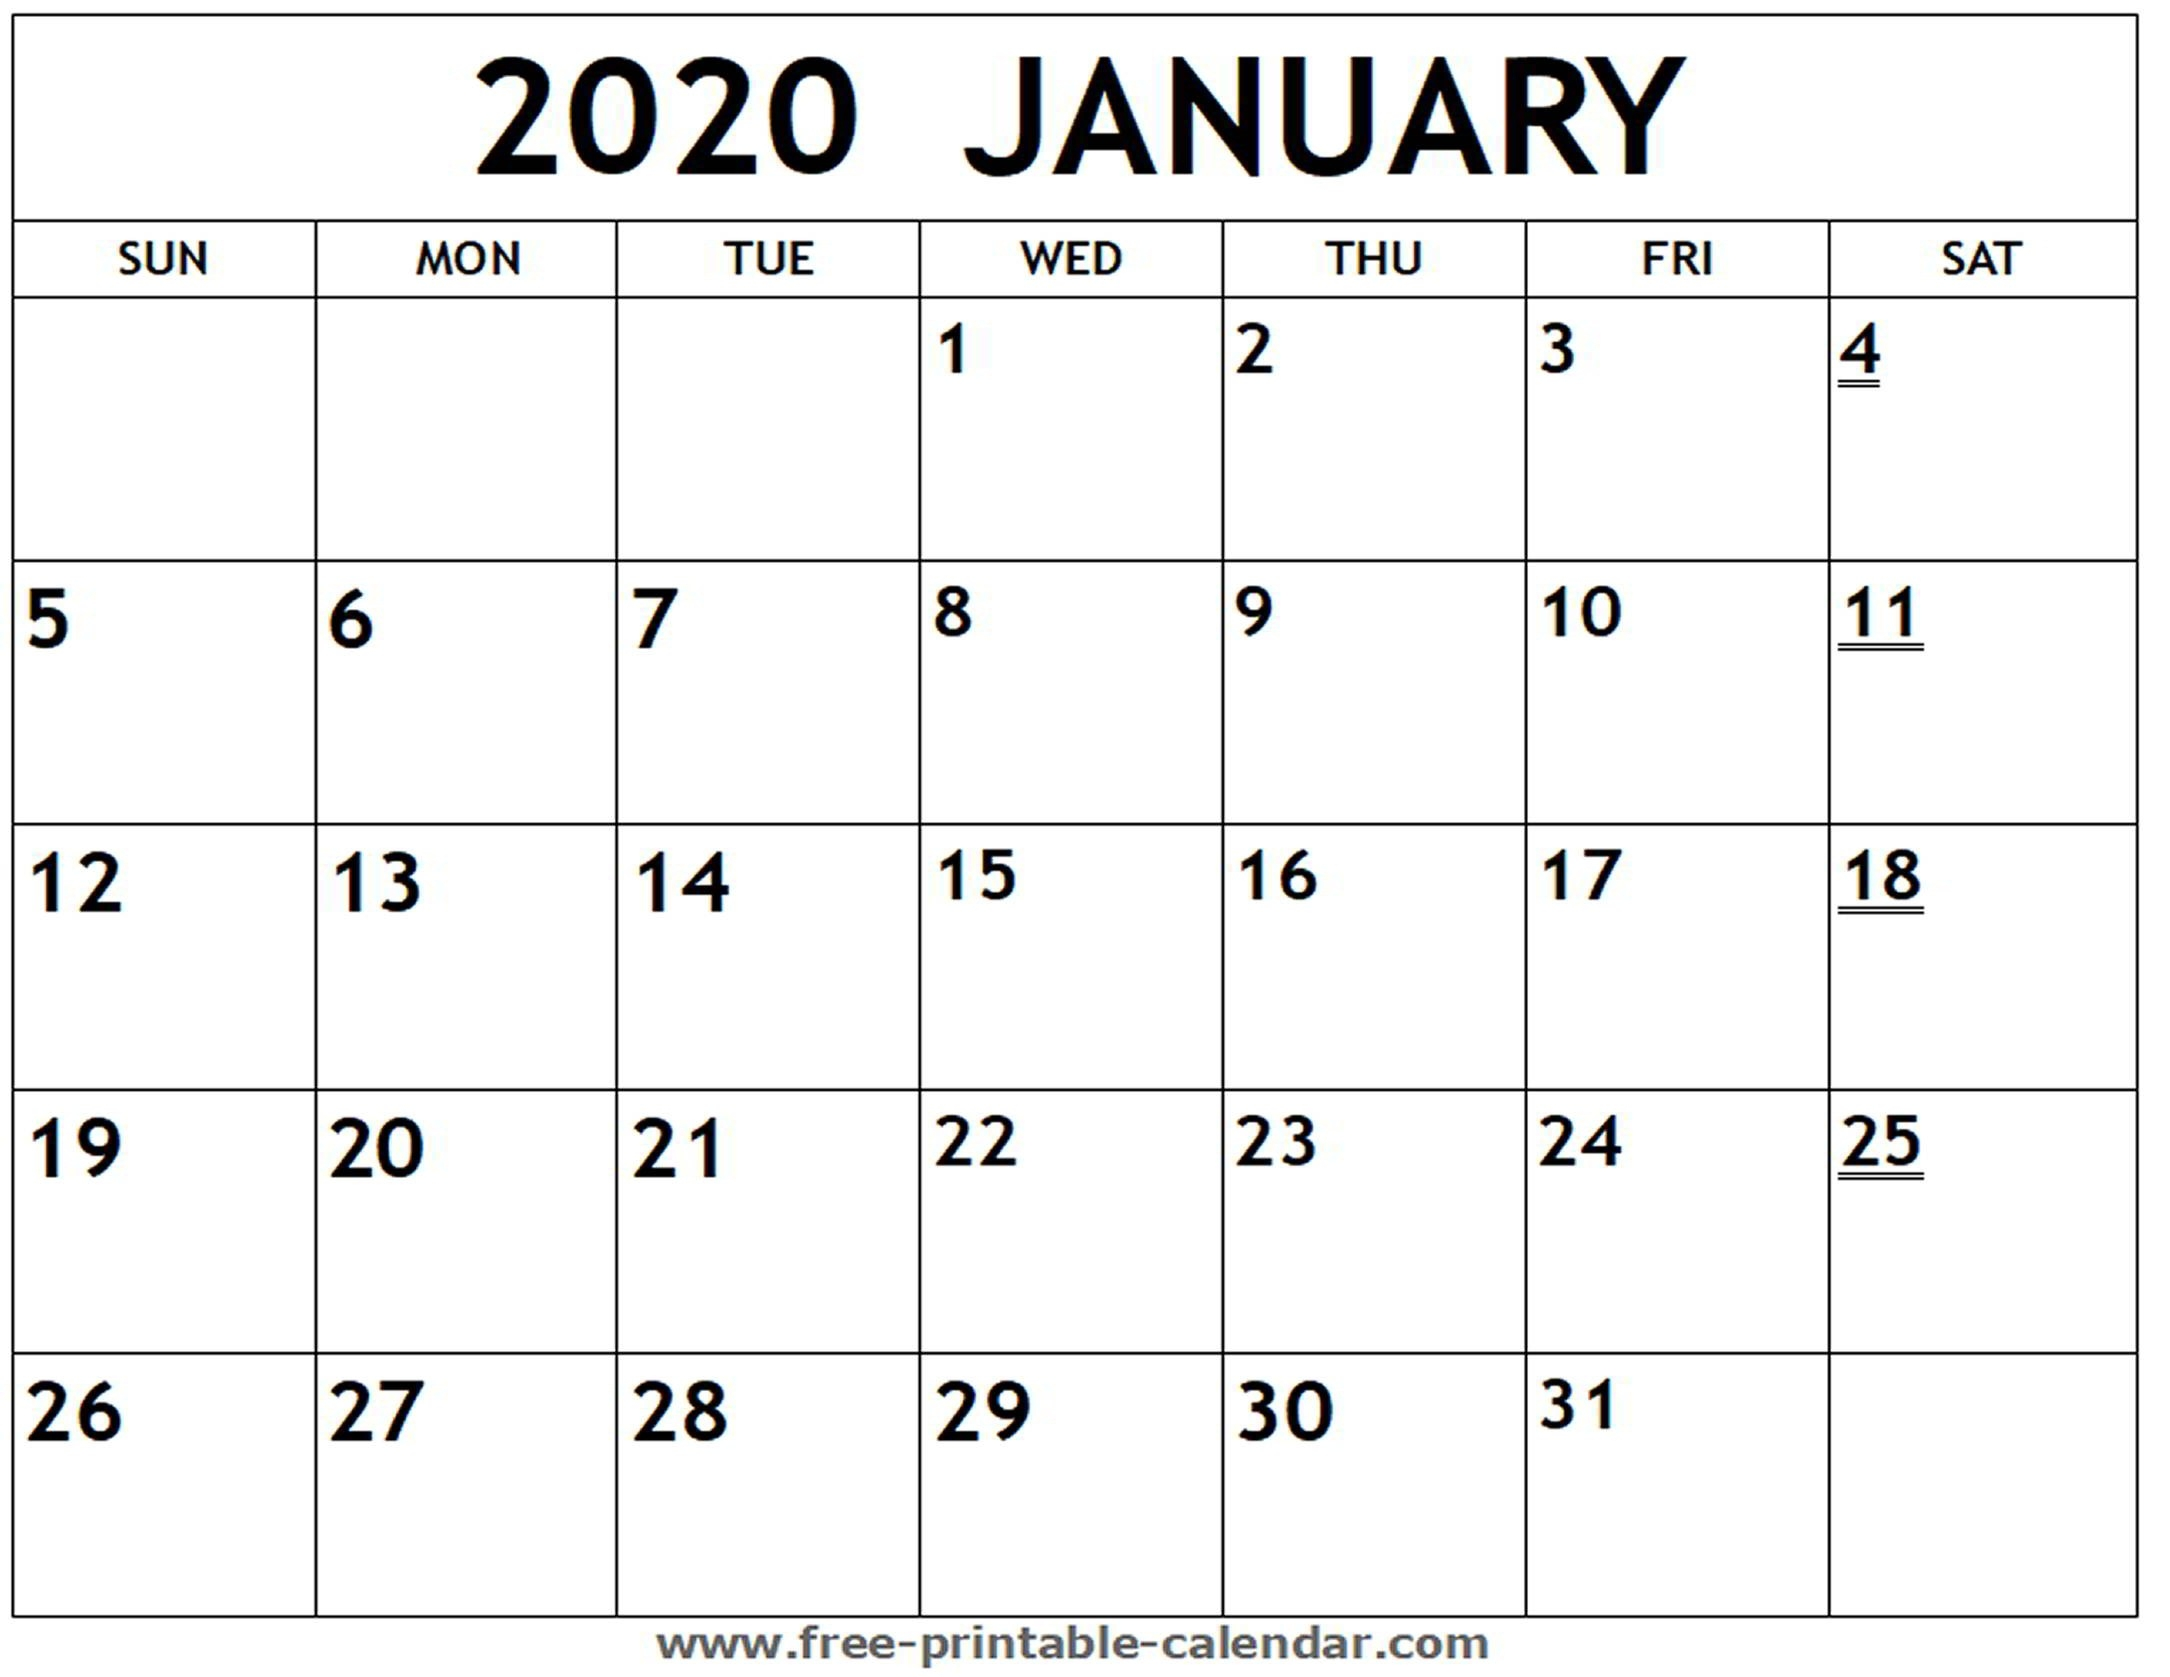 Printable 2020 Monthly Calendars - Wpa.wpart.co-Printable Calendar 2020 Monthly Bills